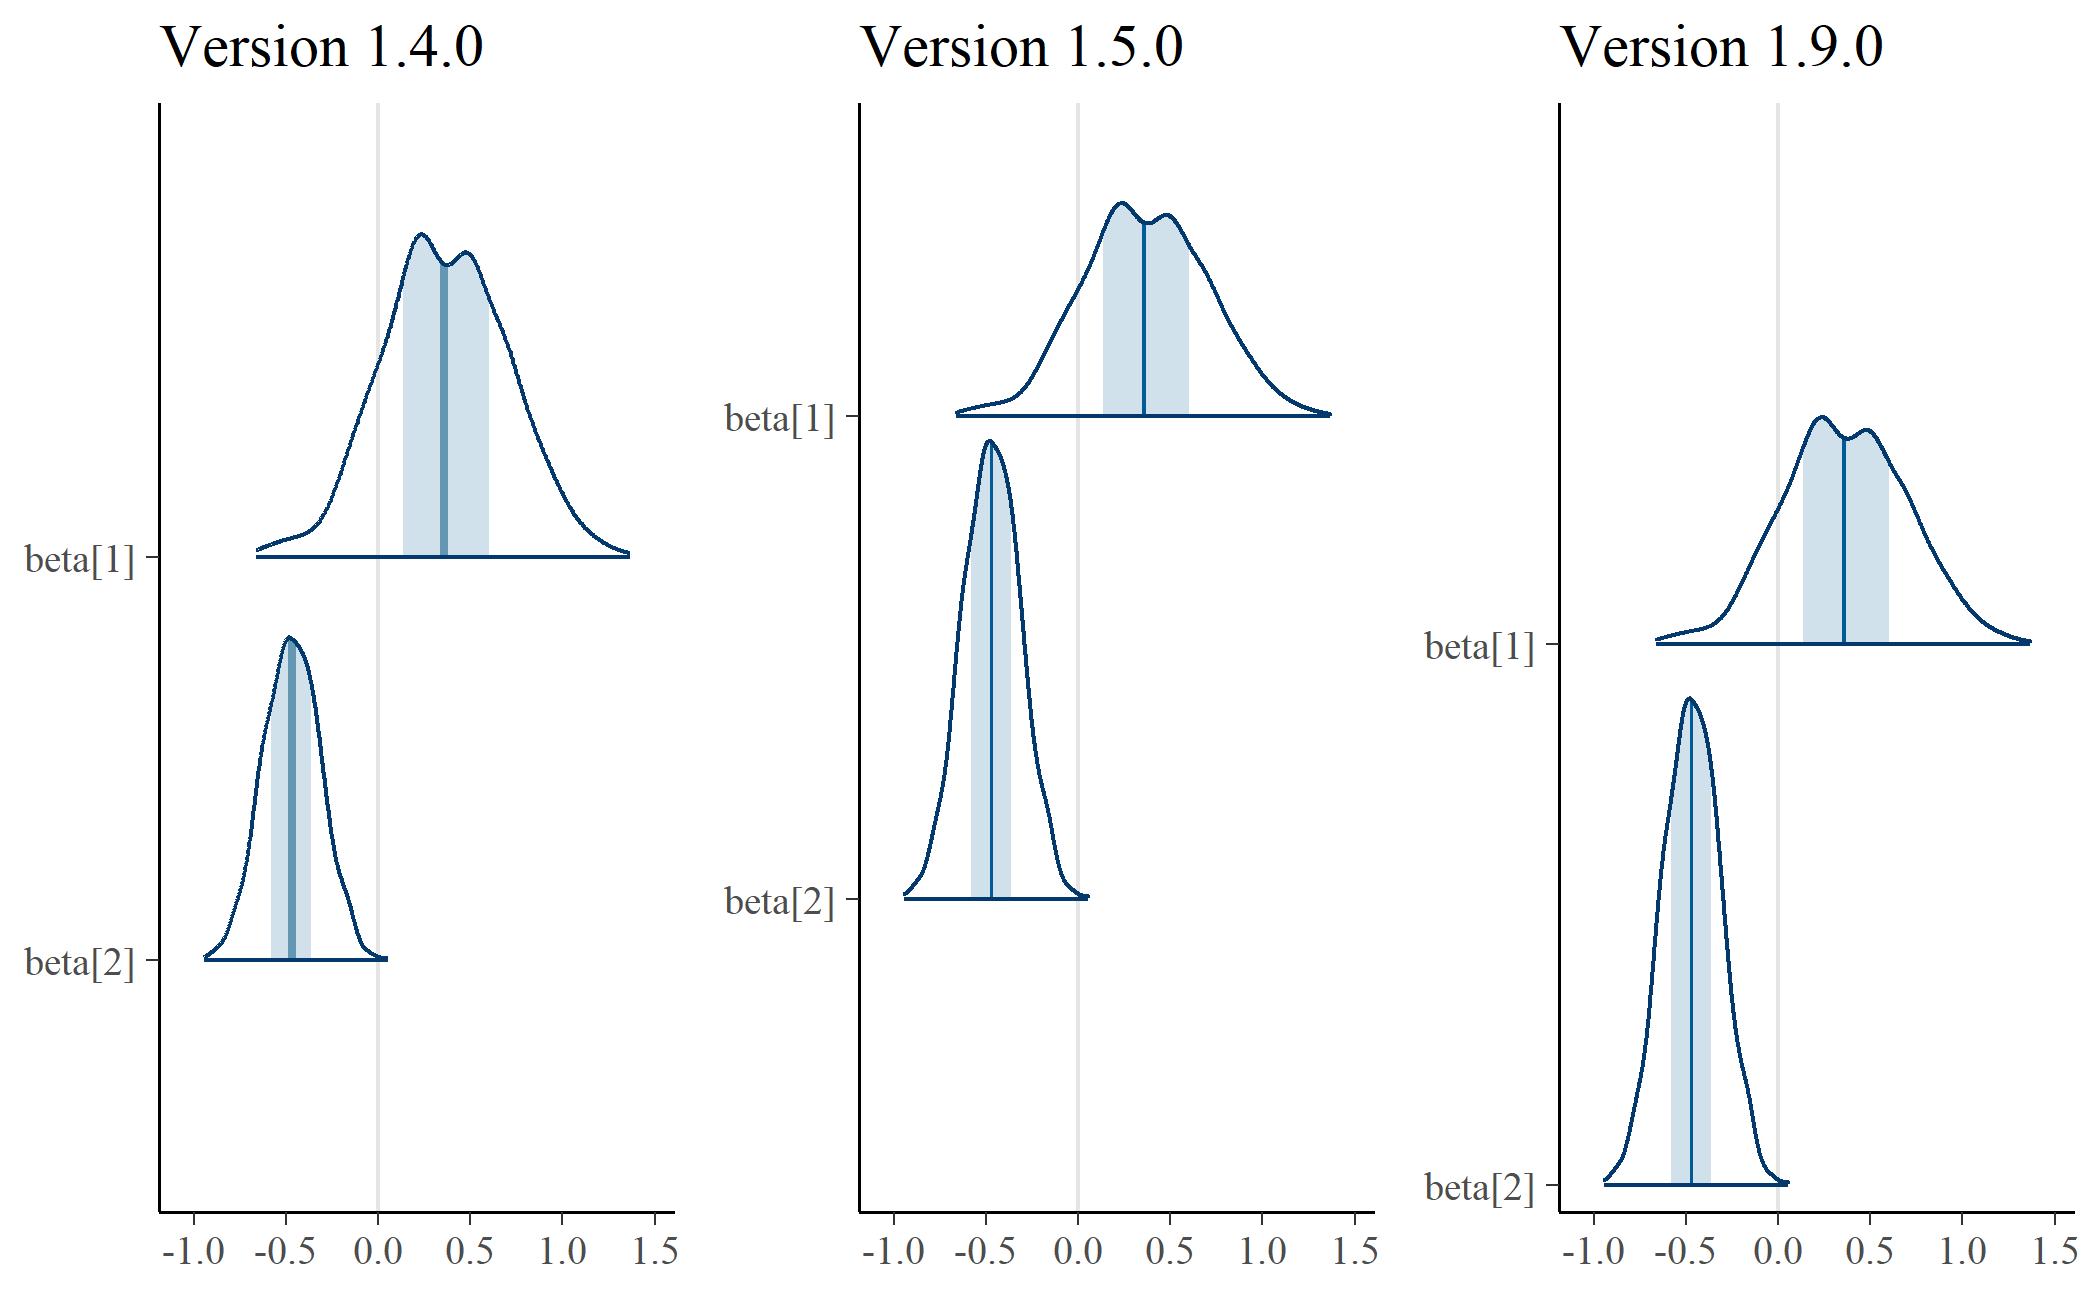 Ridgelines in bayesplot 1.5.0